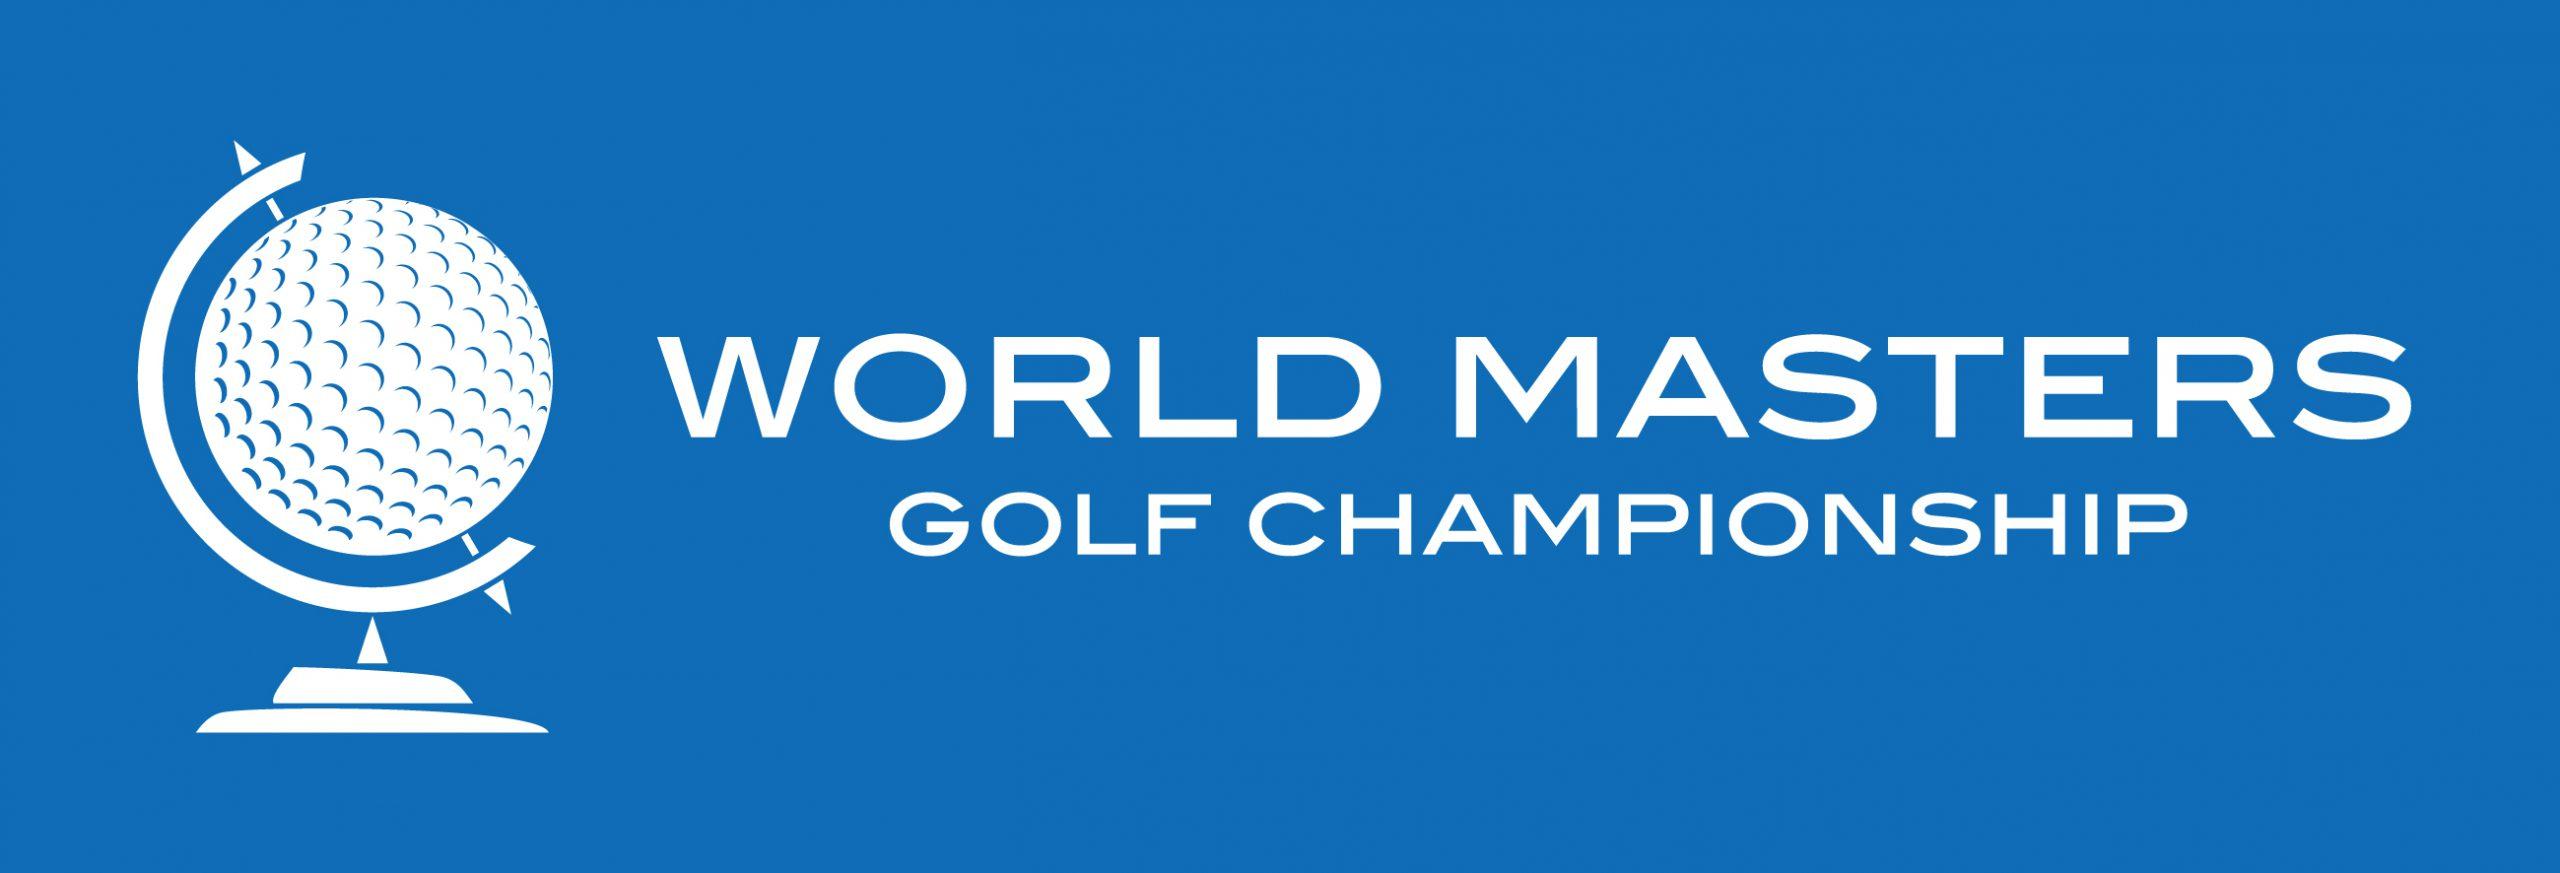 World Masters Golf Championship